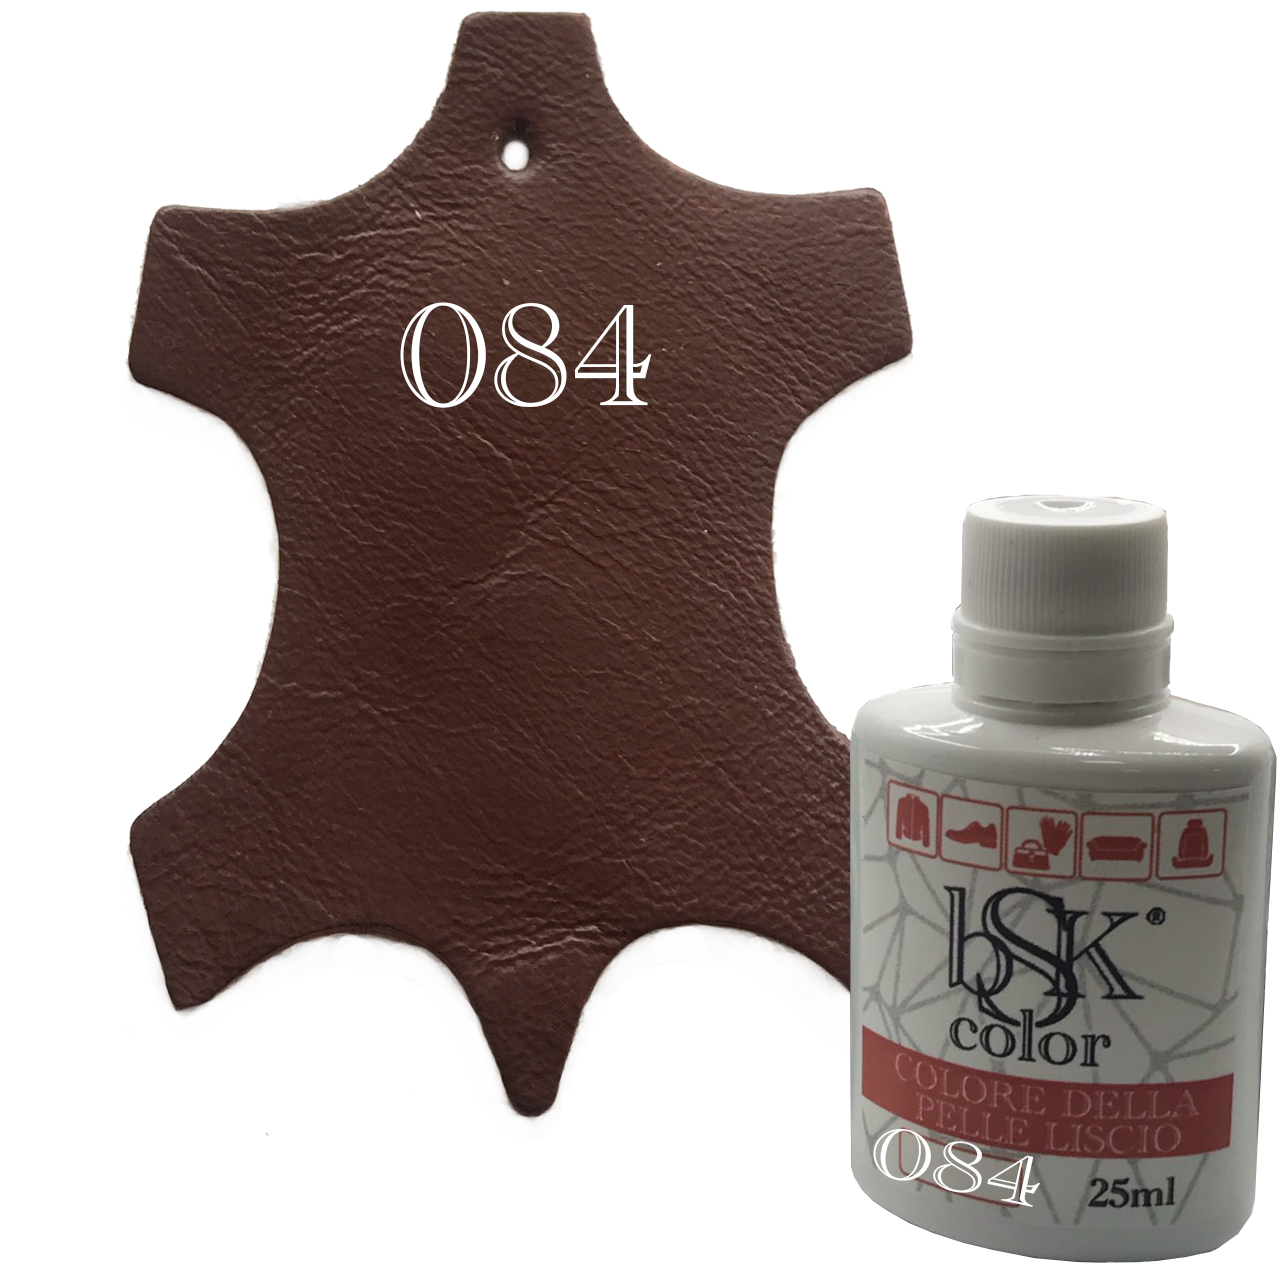 Краска для кожи bsk-color 25ml  , цв.№084